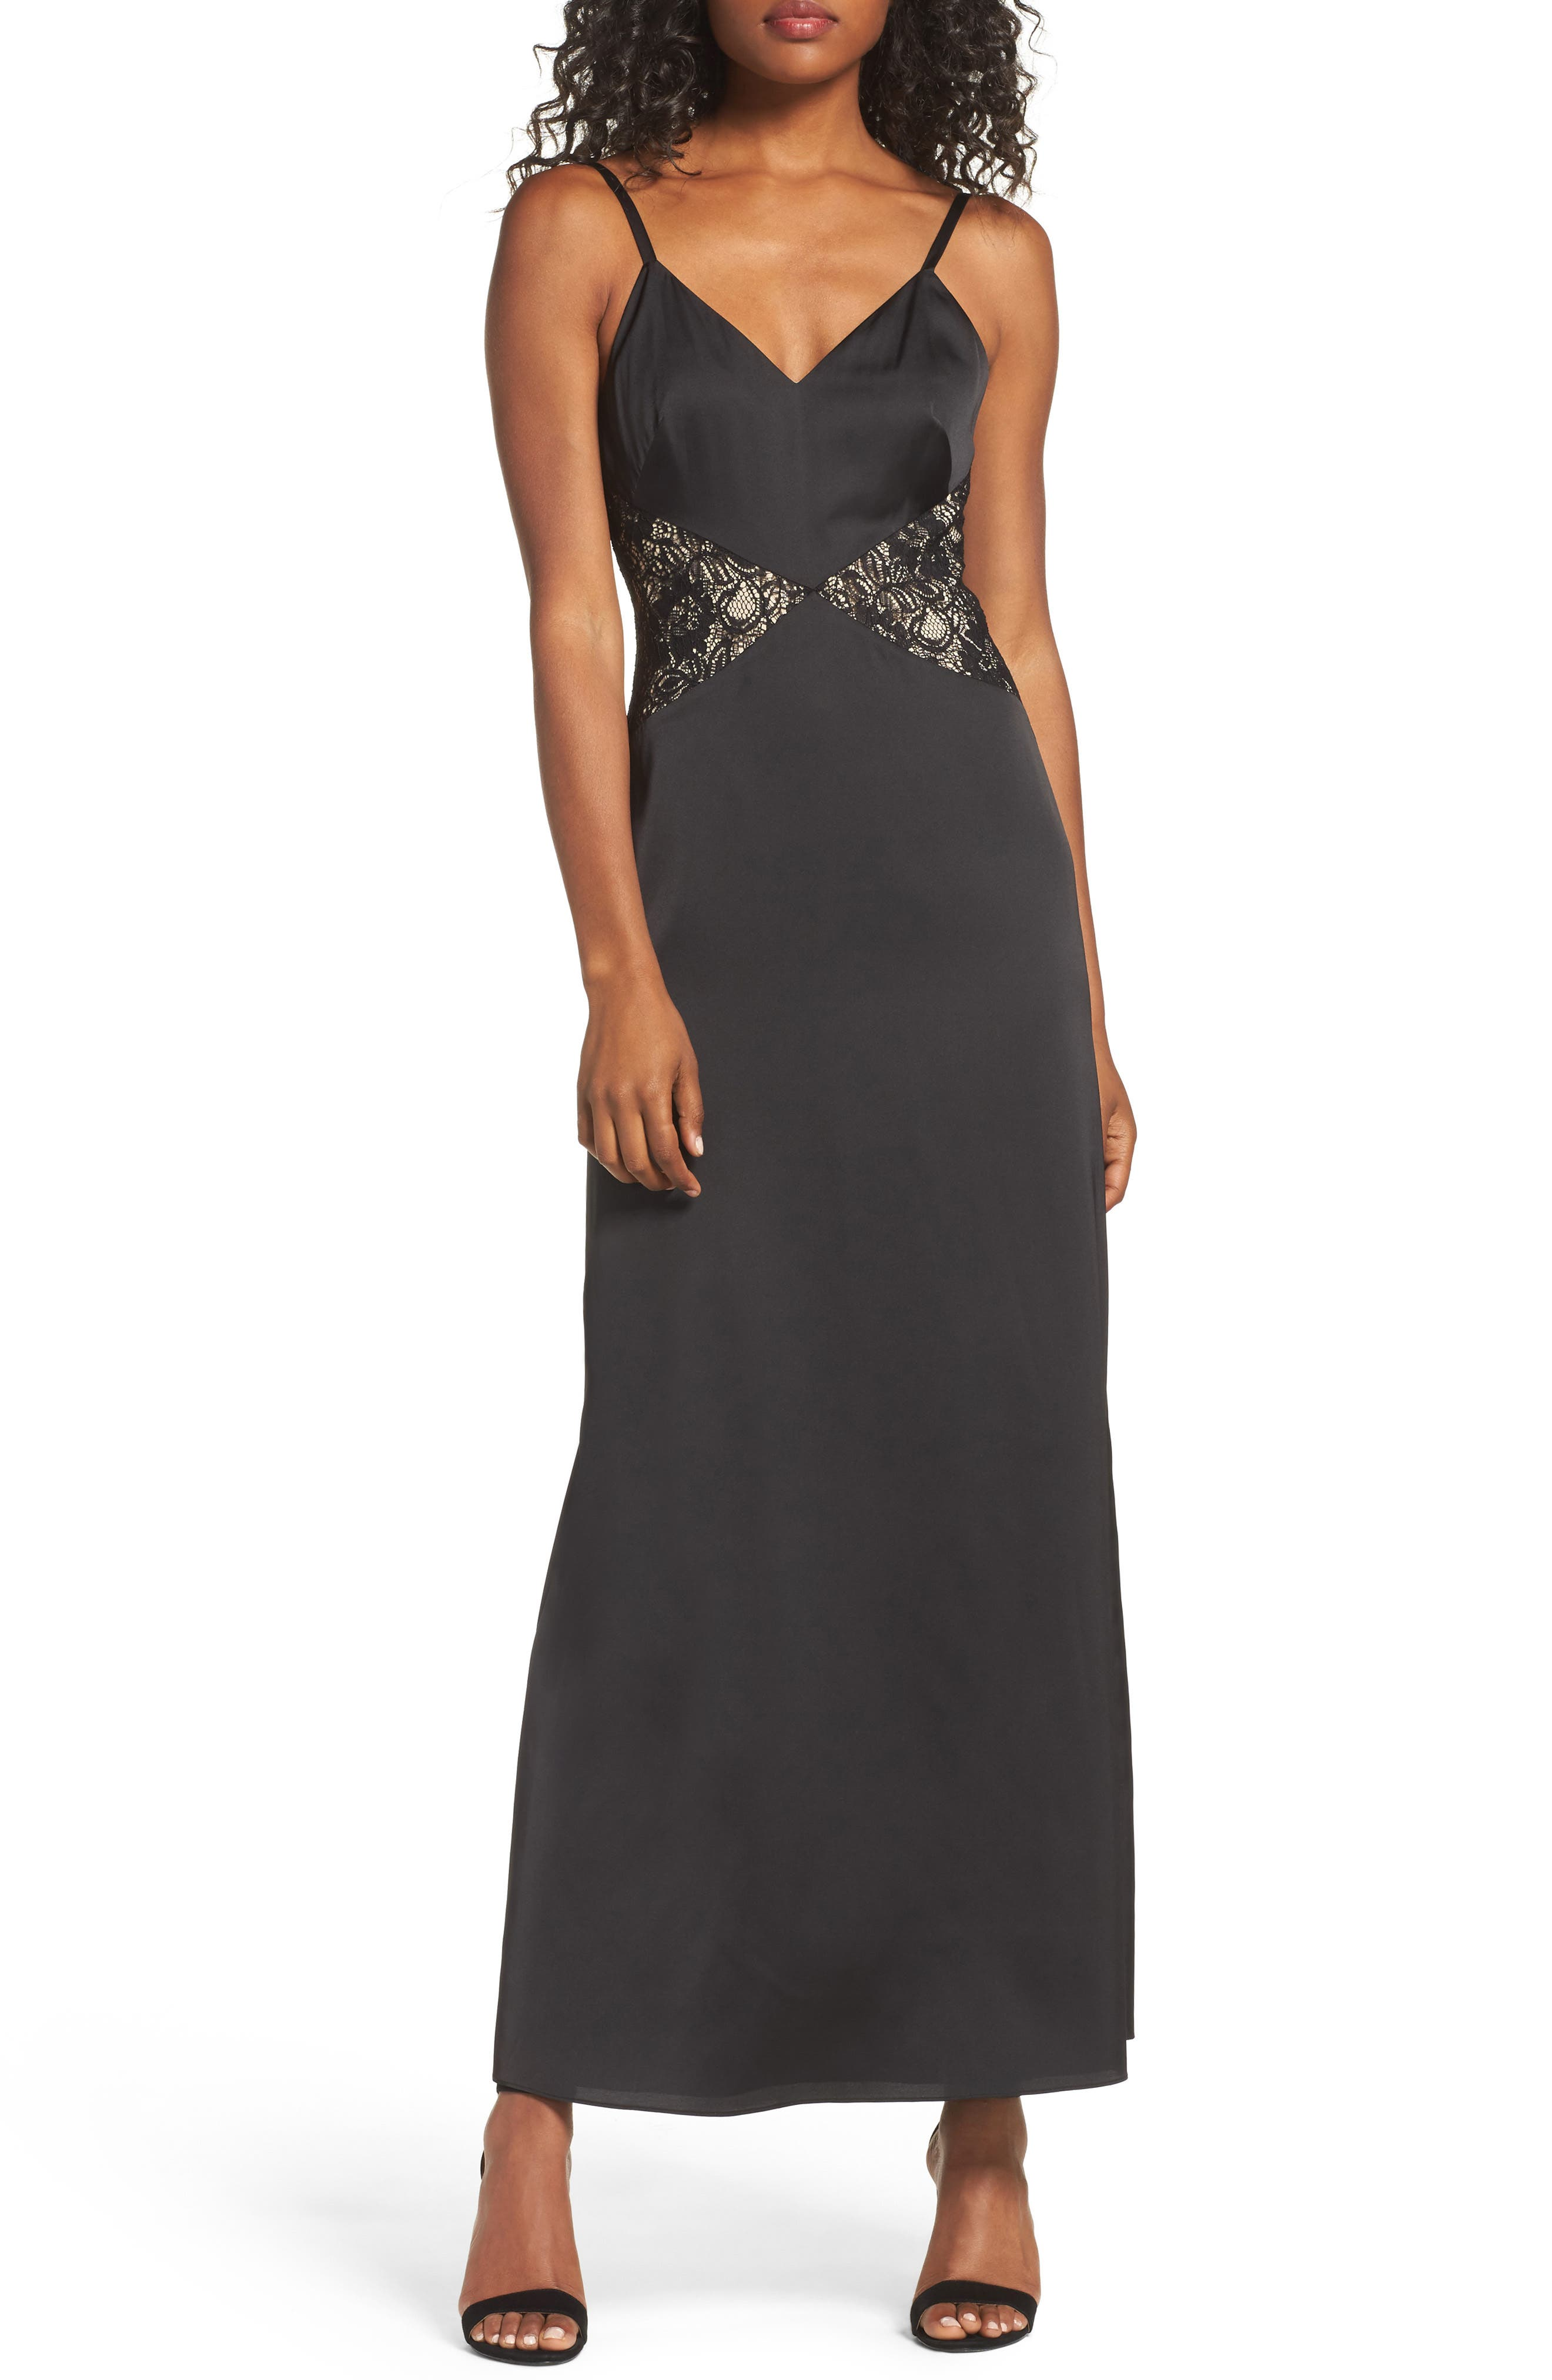 Alternate Image 1 Selected - Ali & Jay Femme Fatale Slip Dress